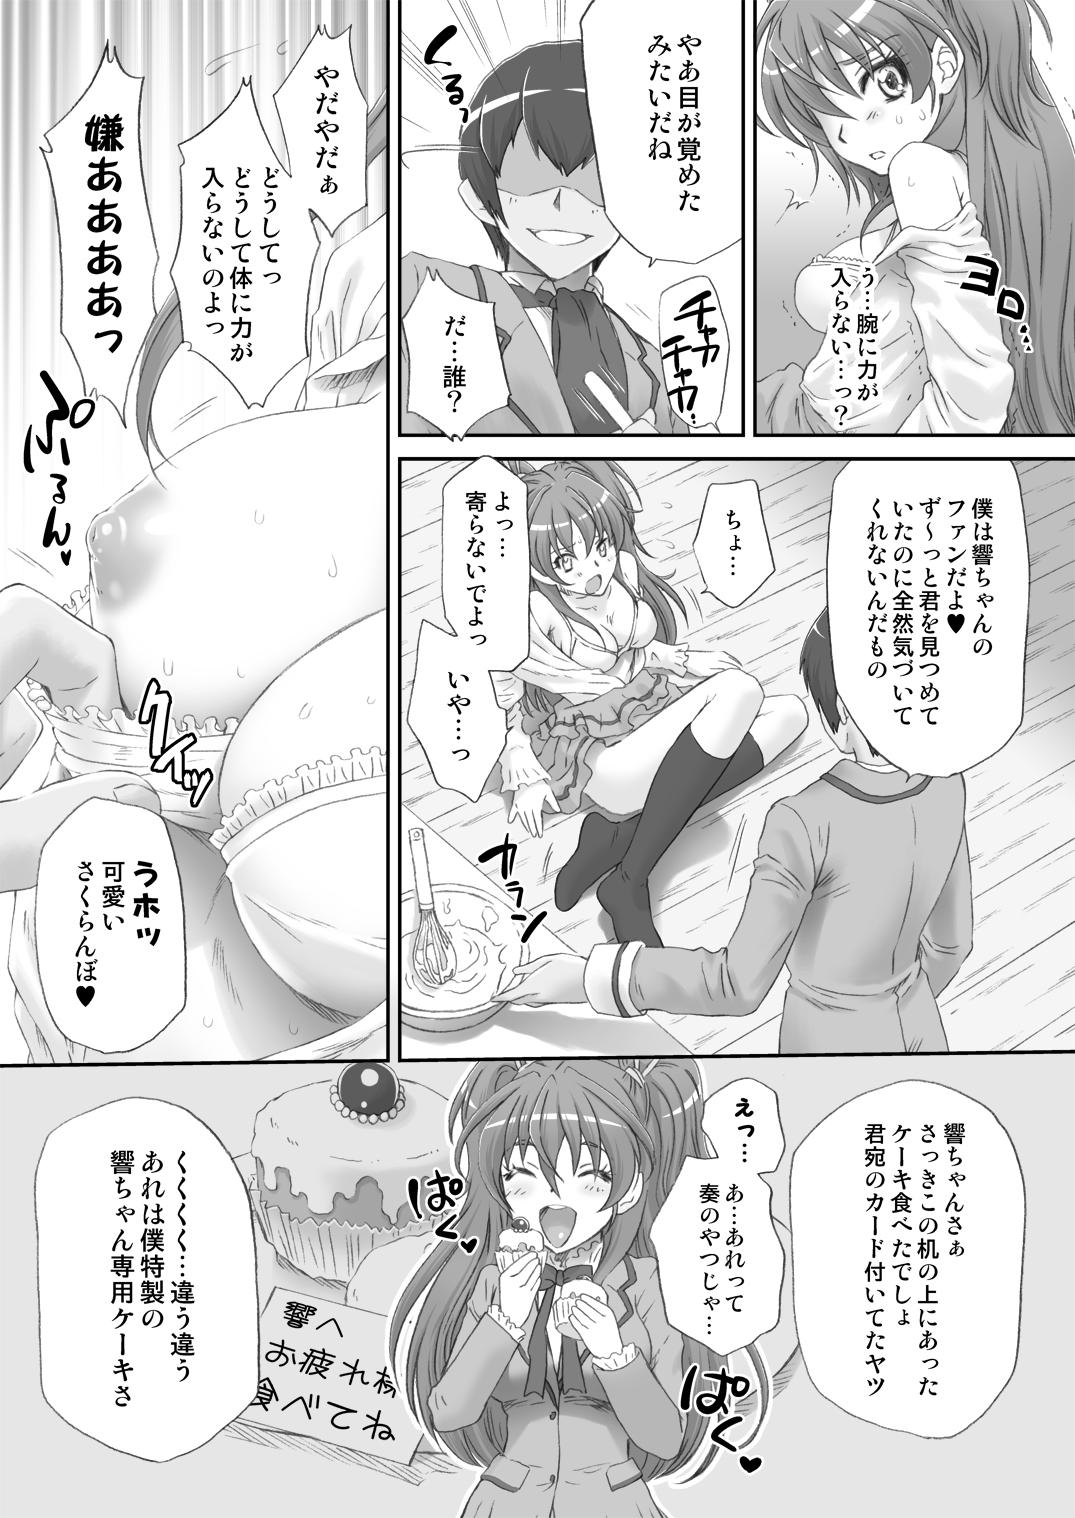 Hibiki de asobou ♪ 6